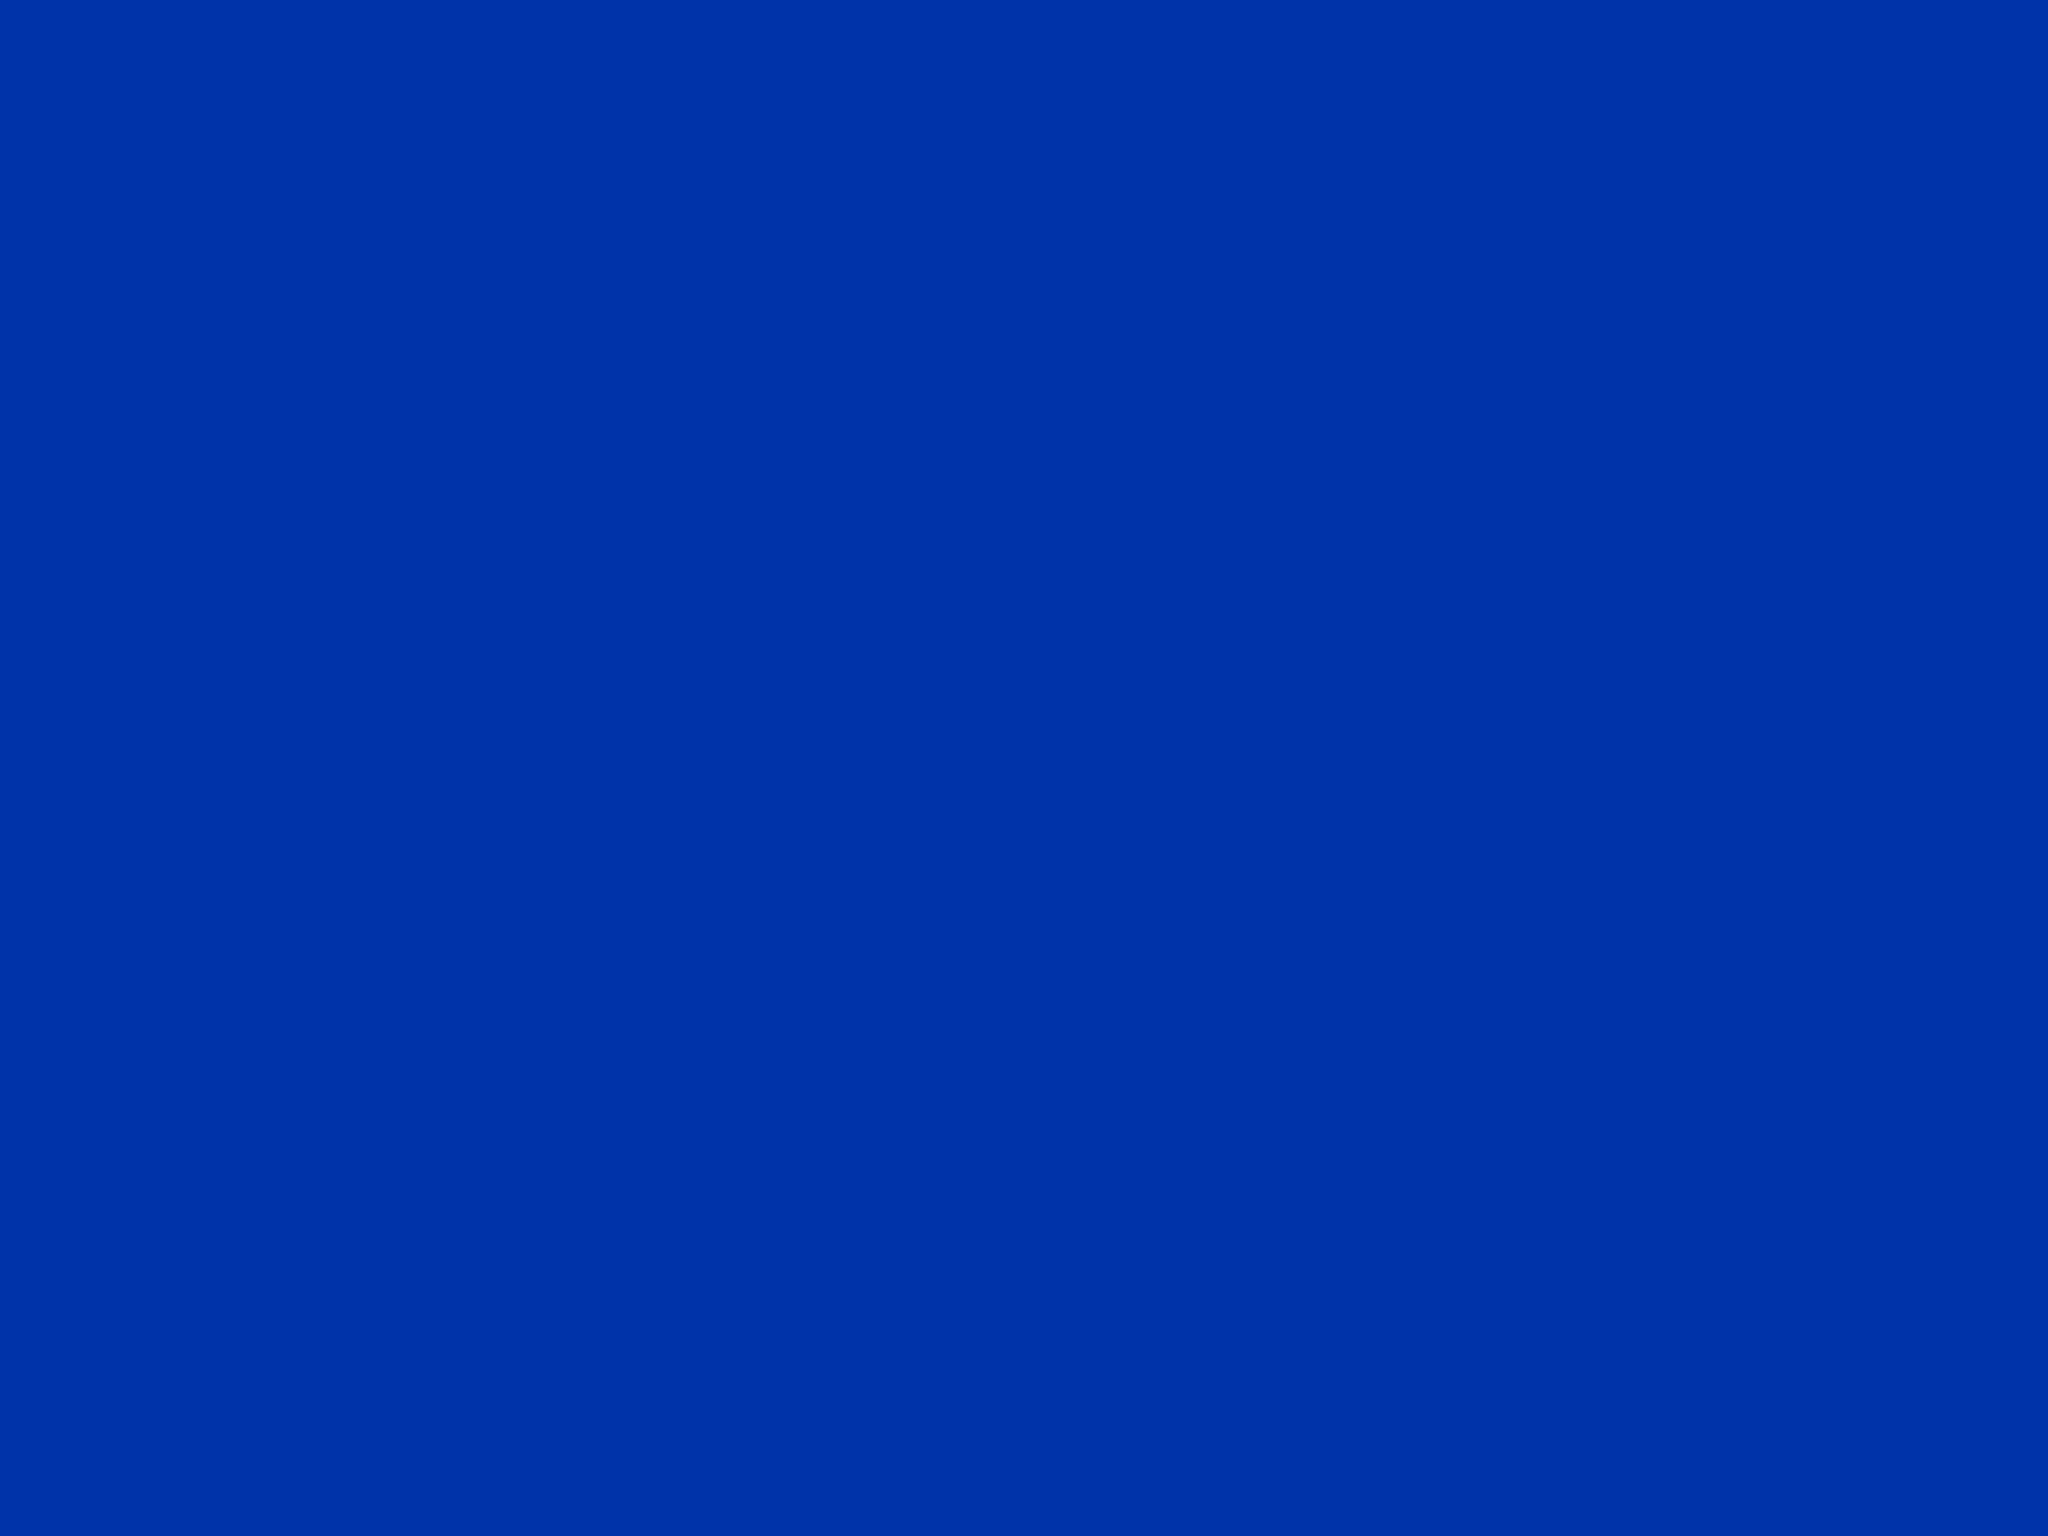 2048x1536 UA Blue Solid Color Background